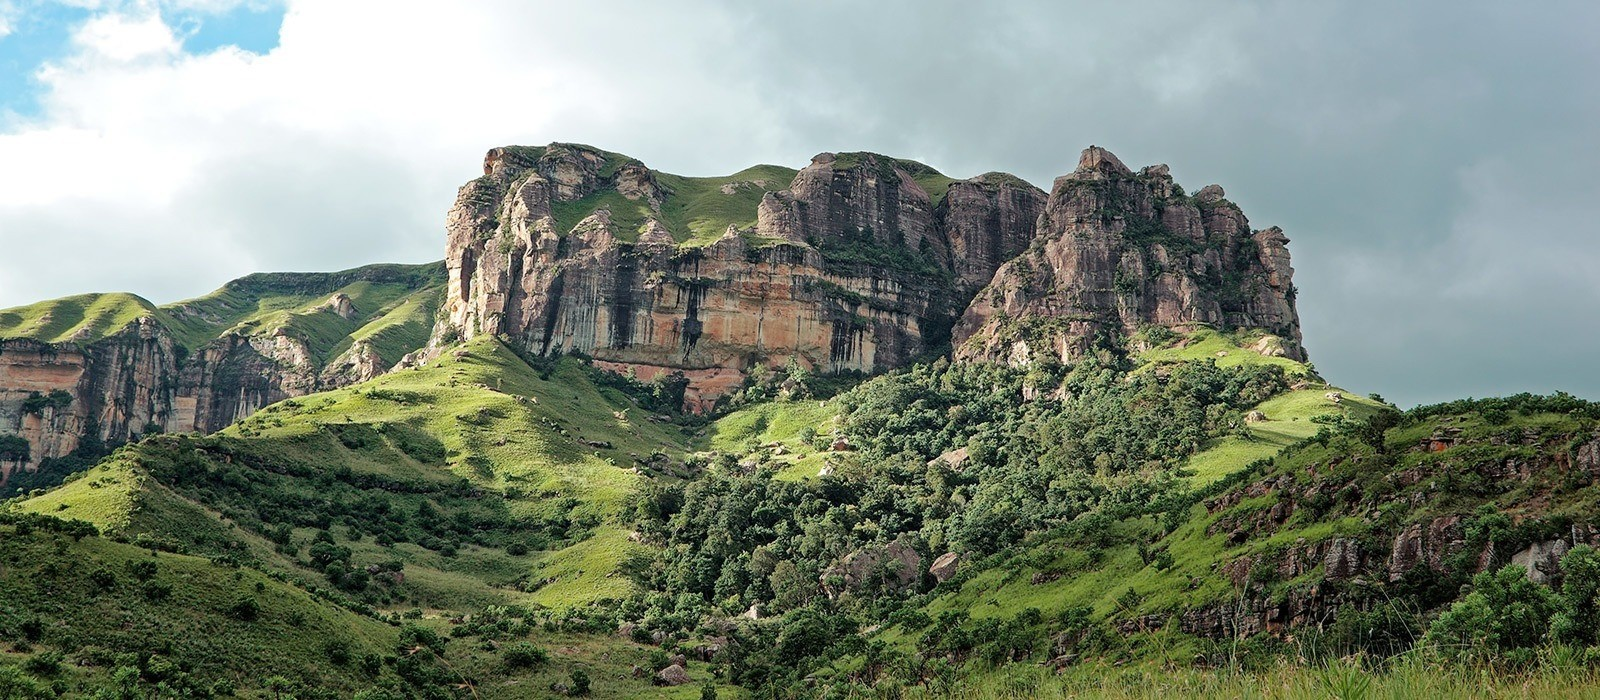 Destination Northern Drakensberg South Africa